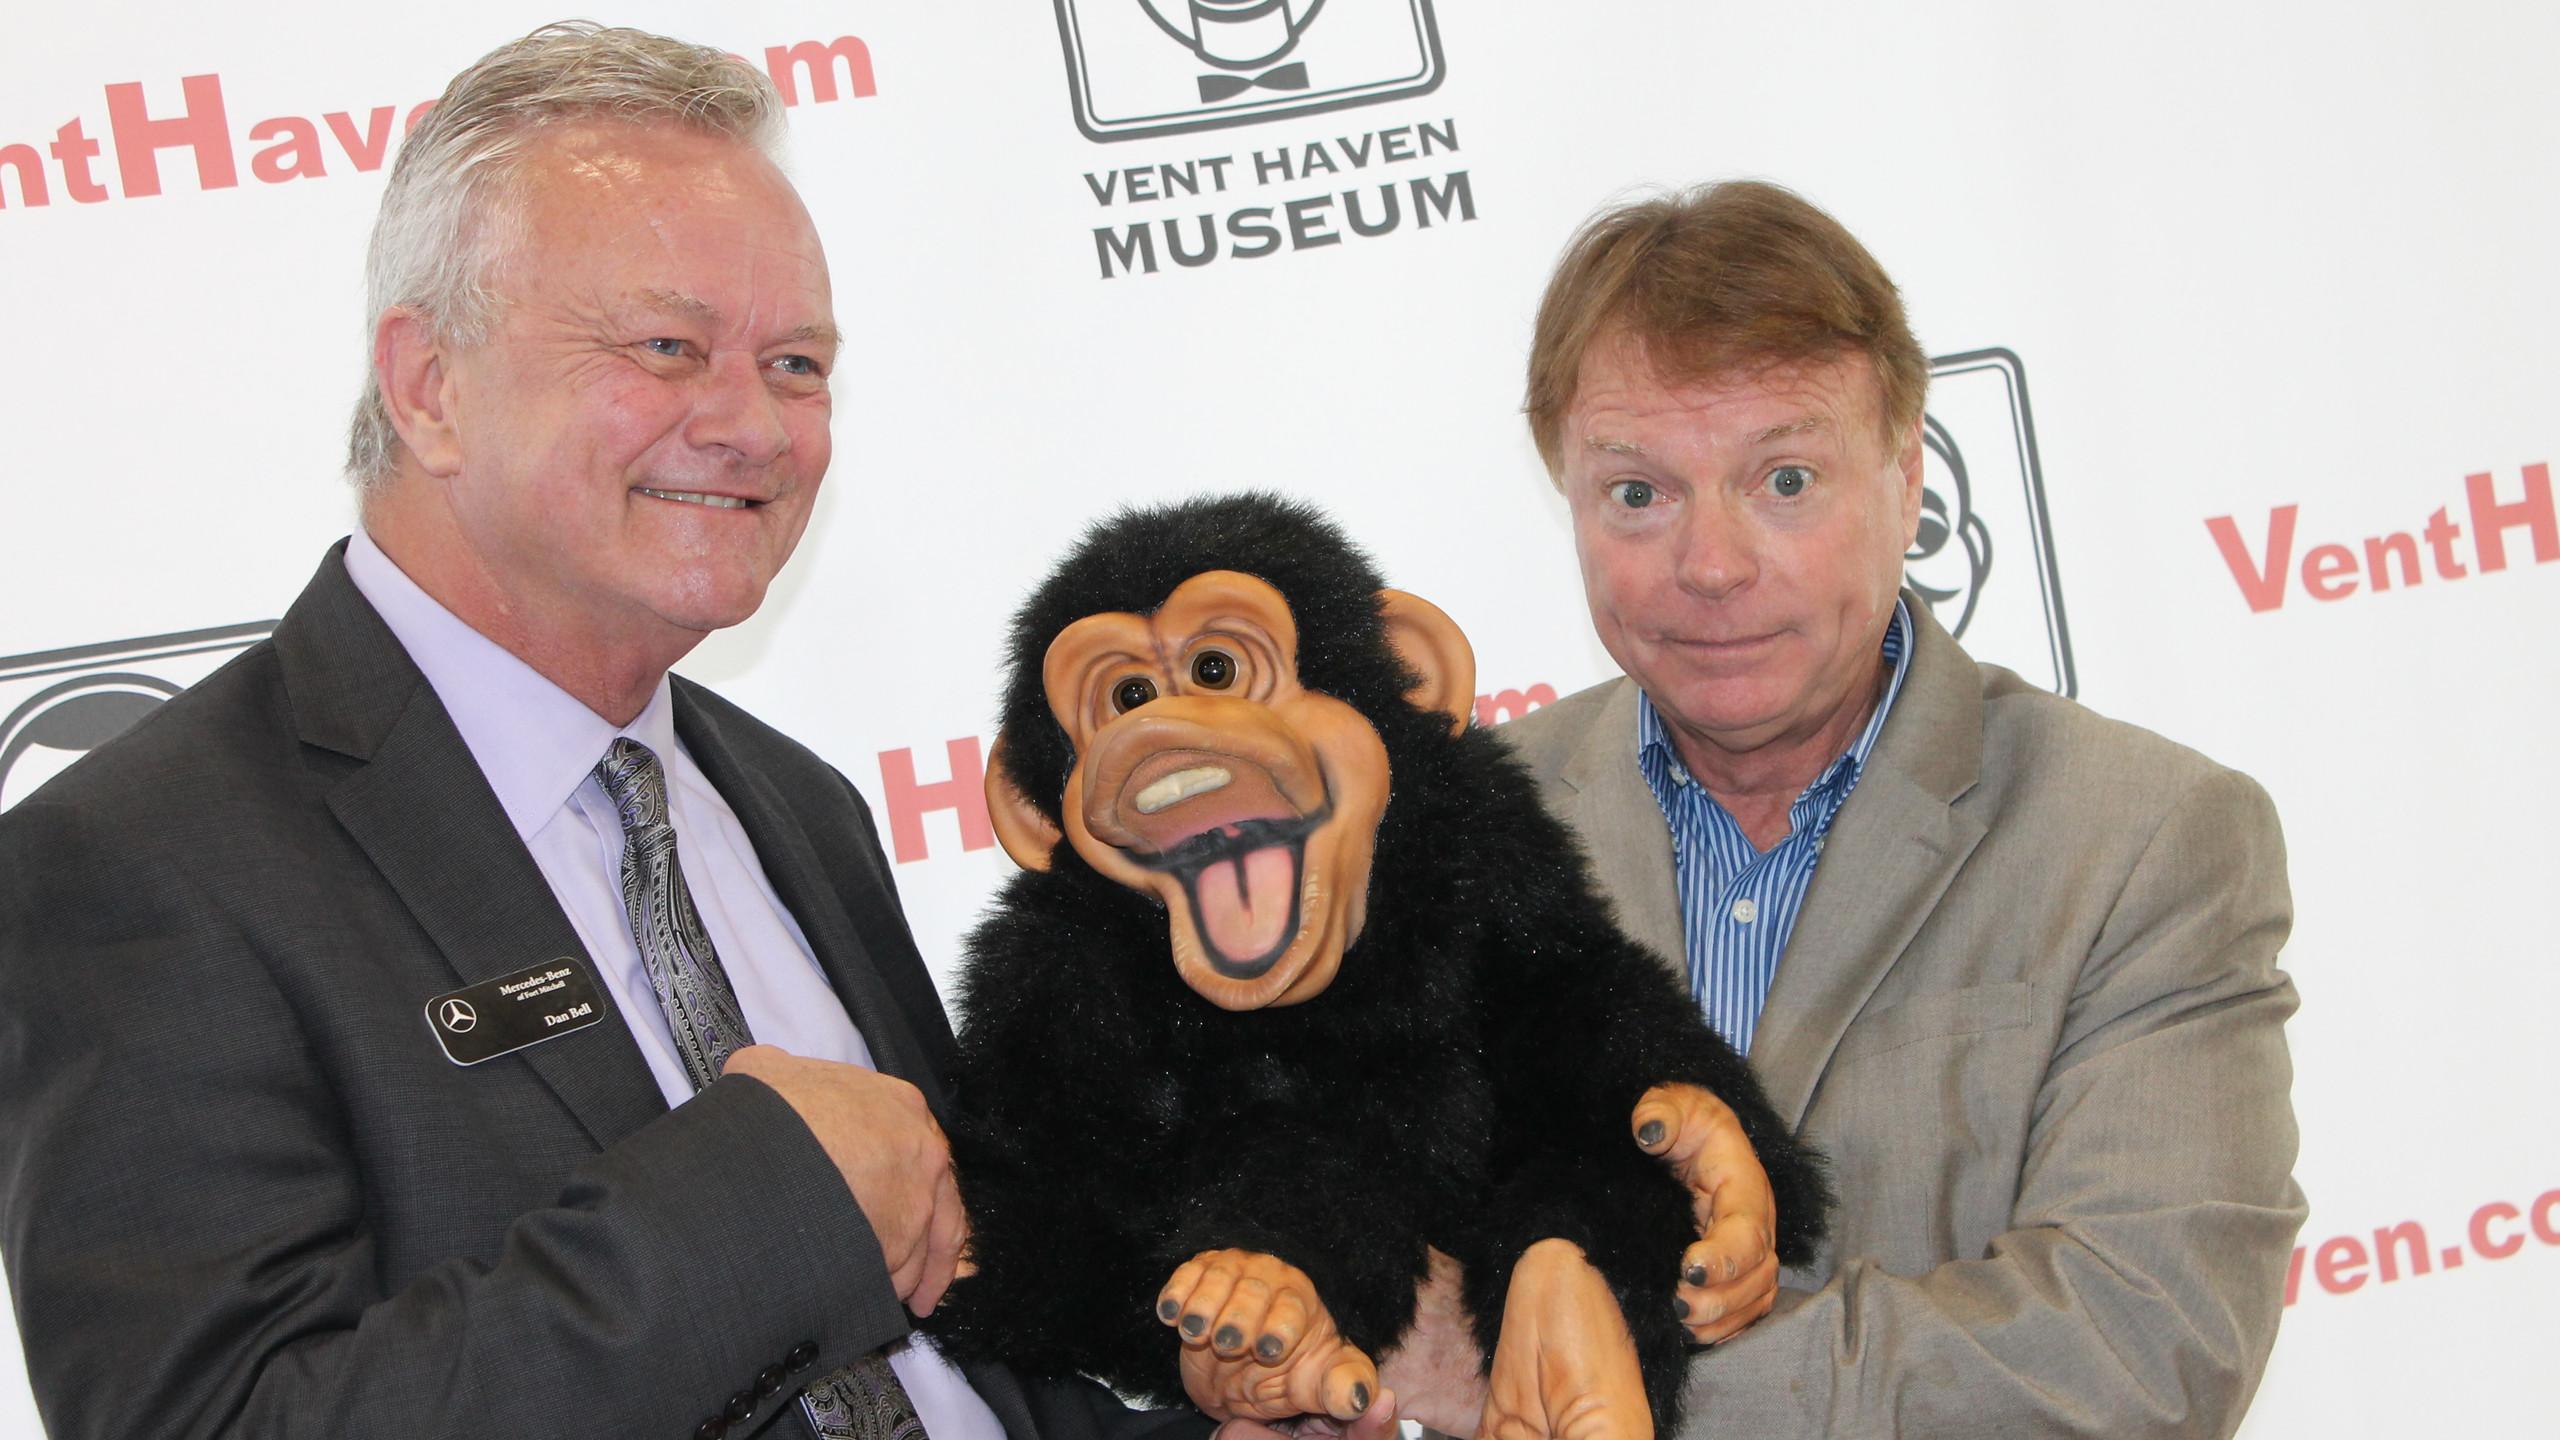 Dan Bell meets Jay Johnson & friend